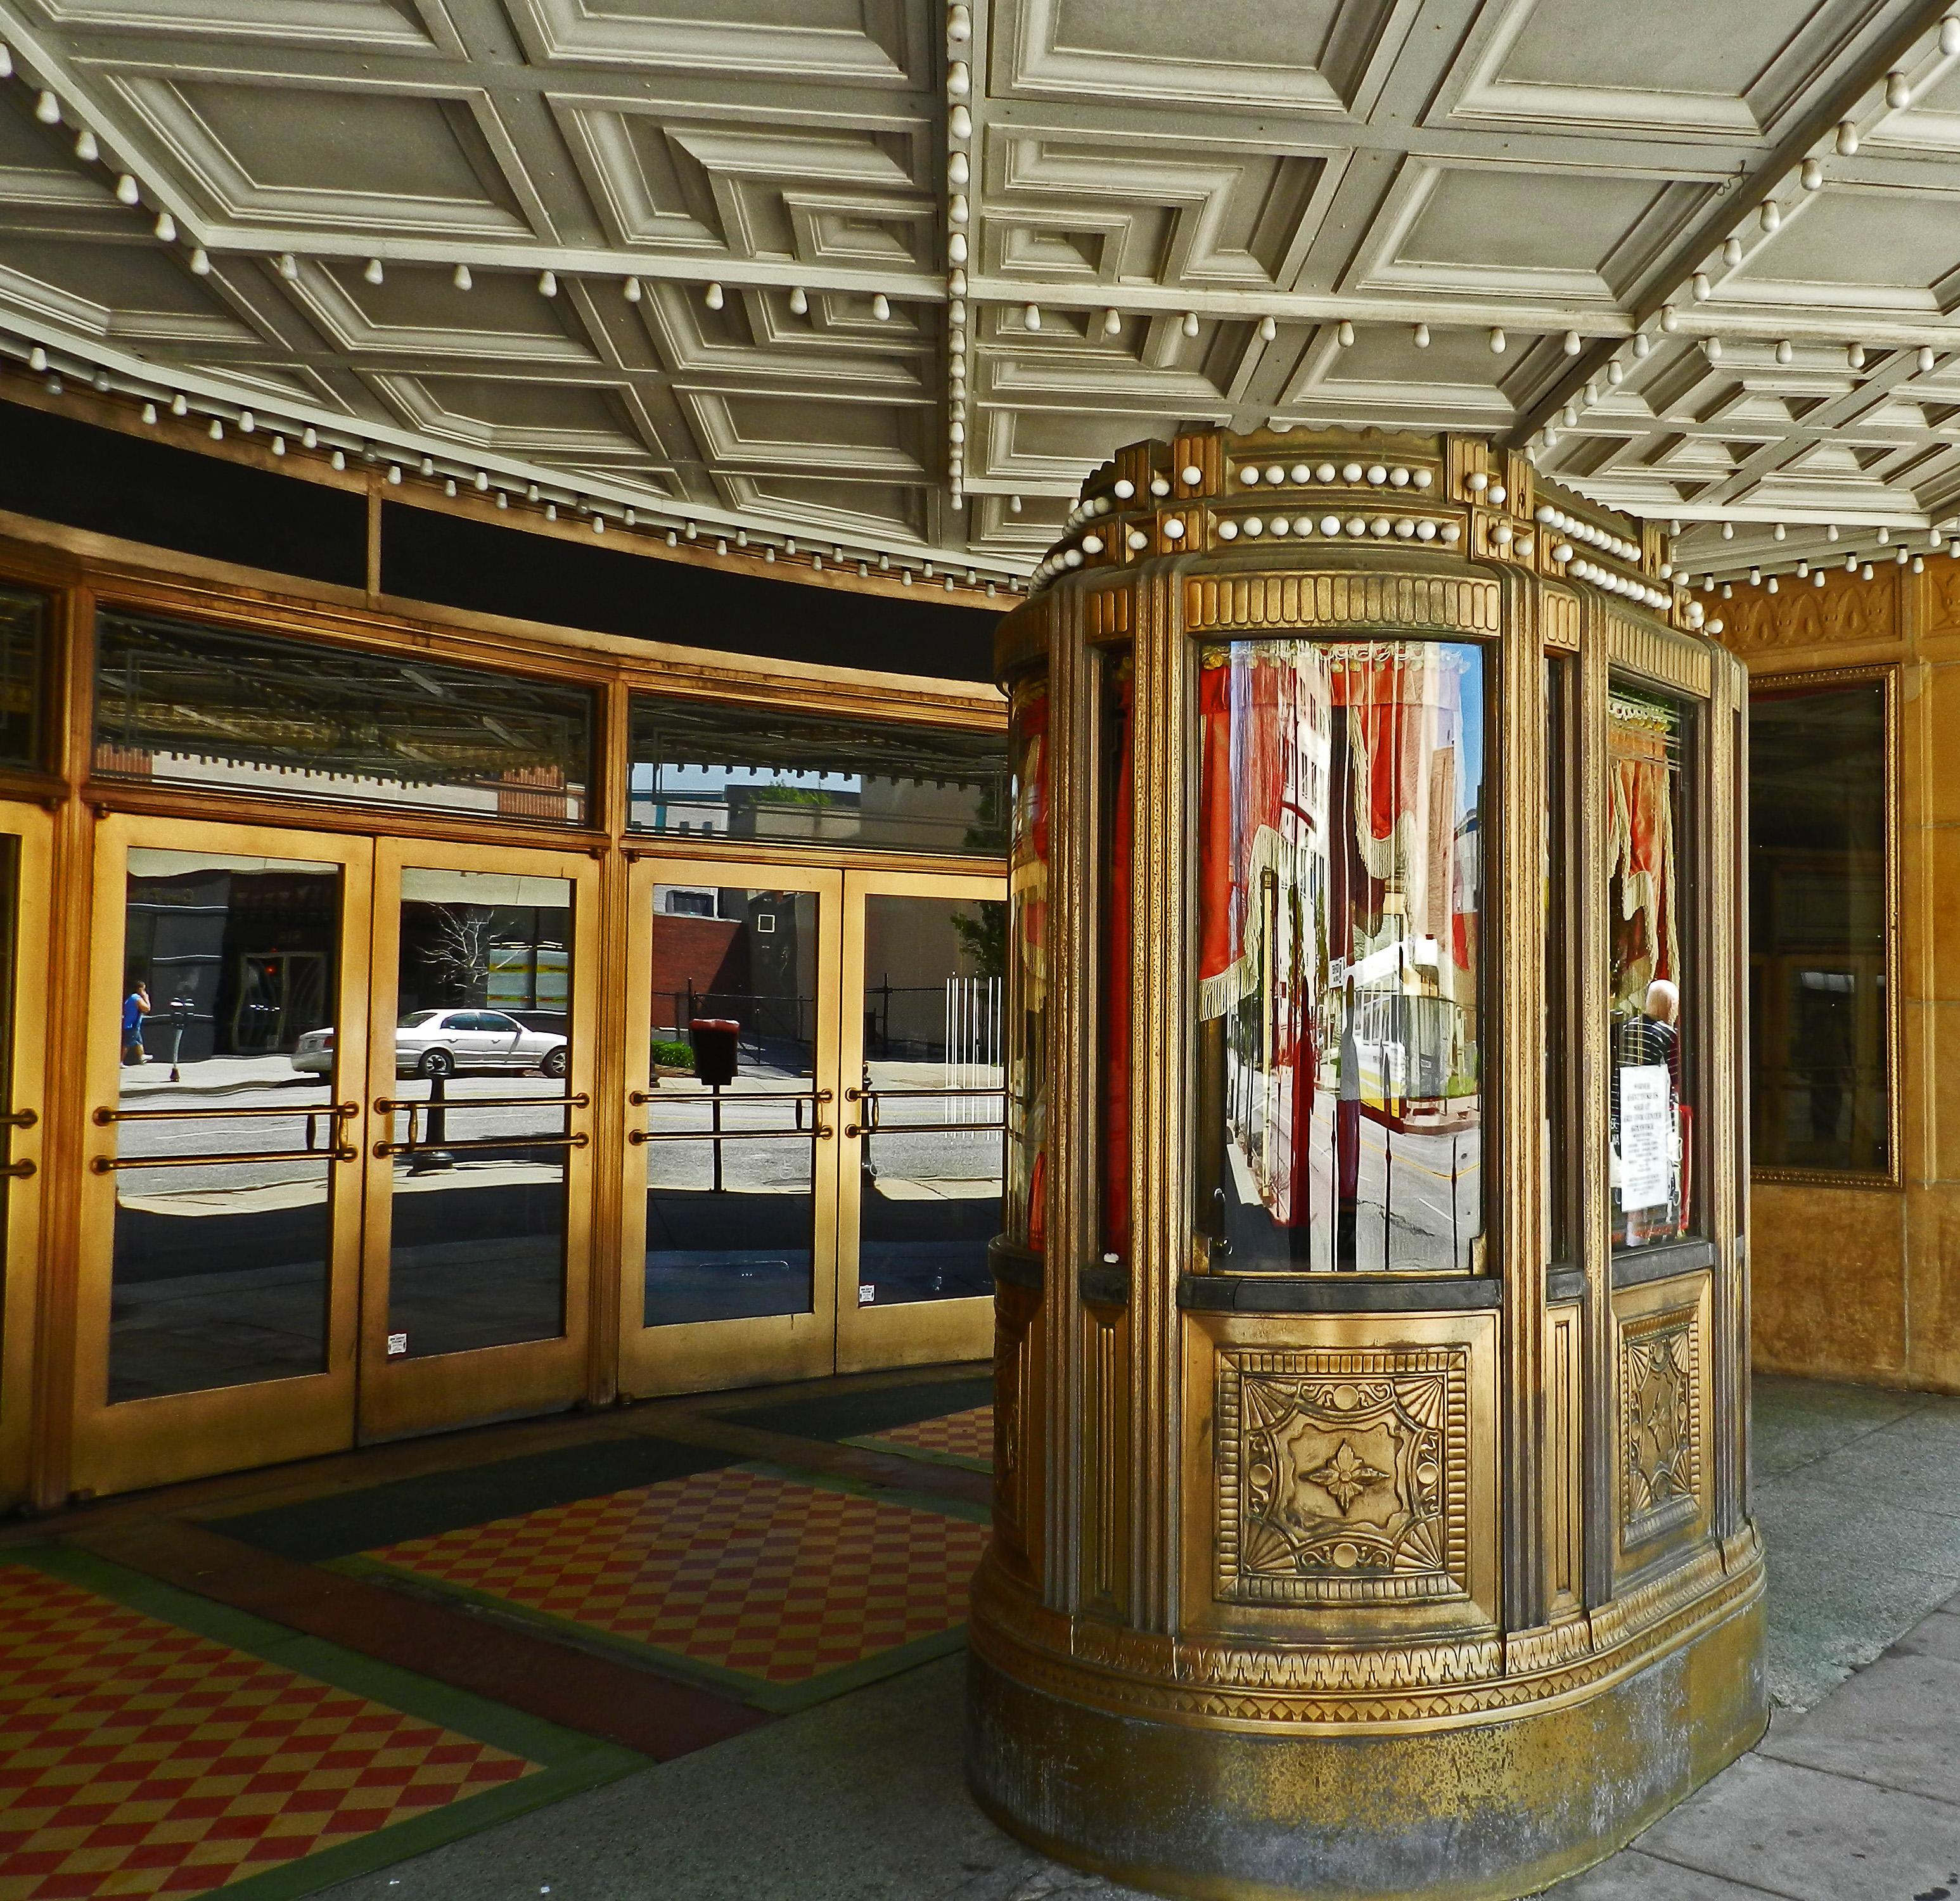 File:Warner Theater in Erie, PA.jpg - Wikimedia Commons